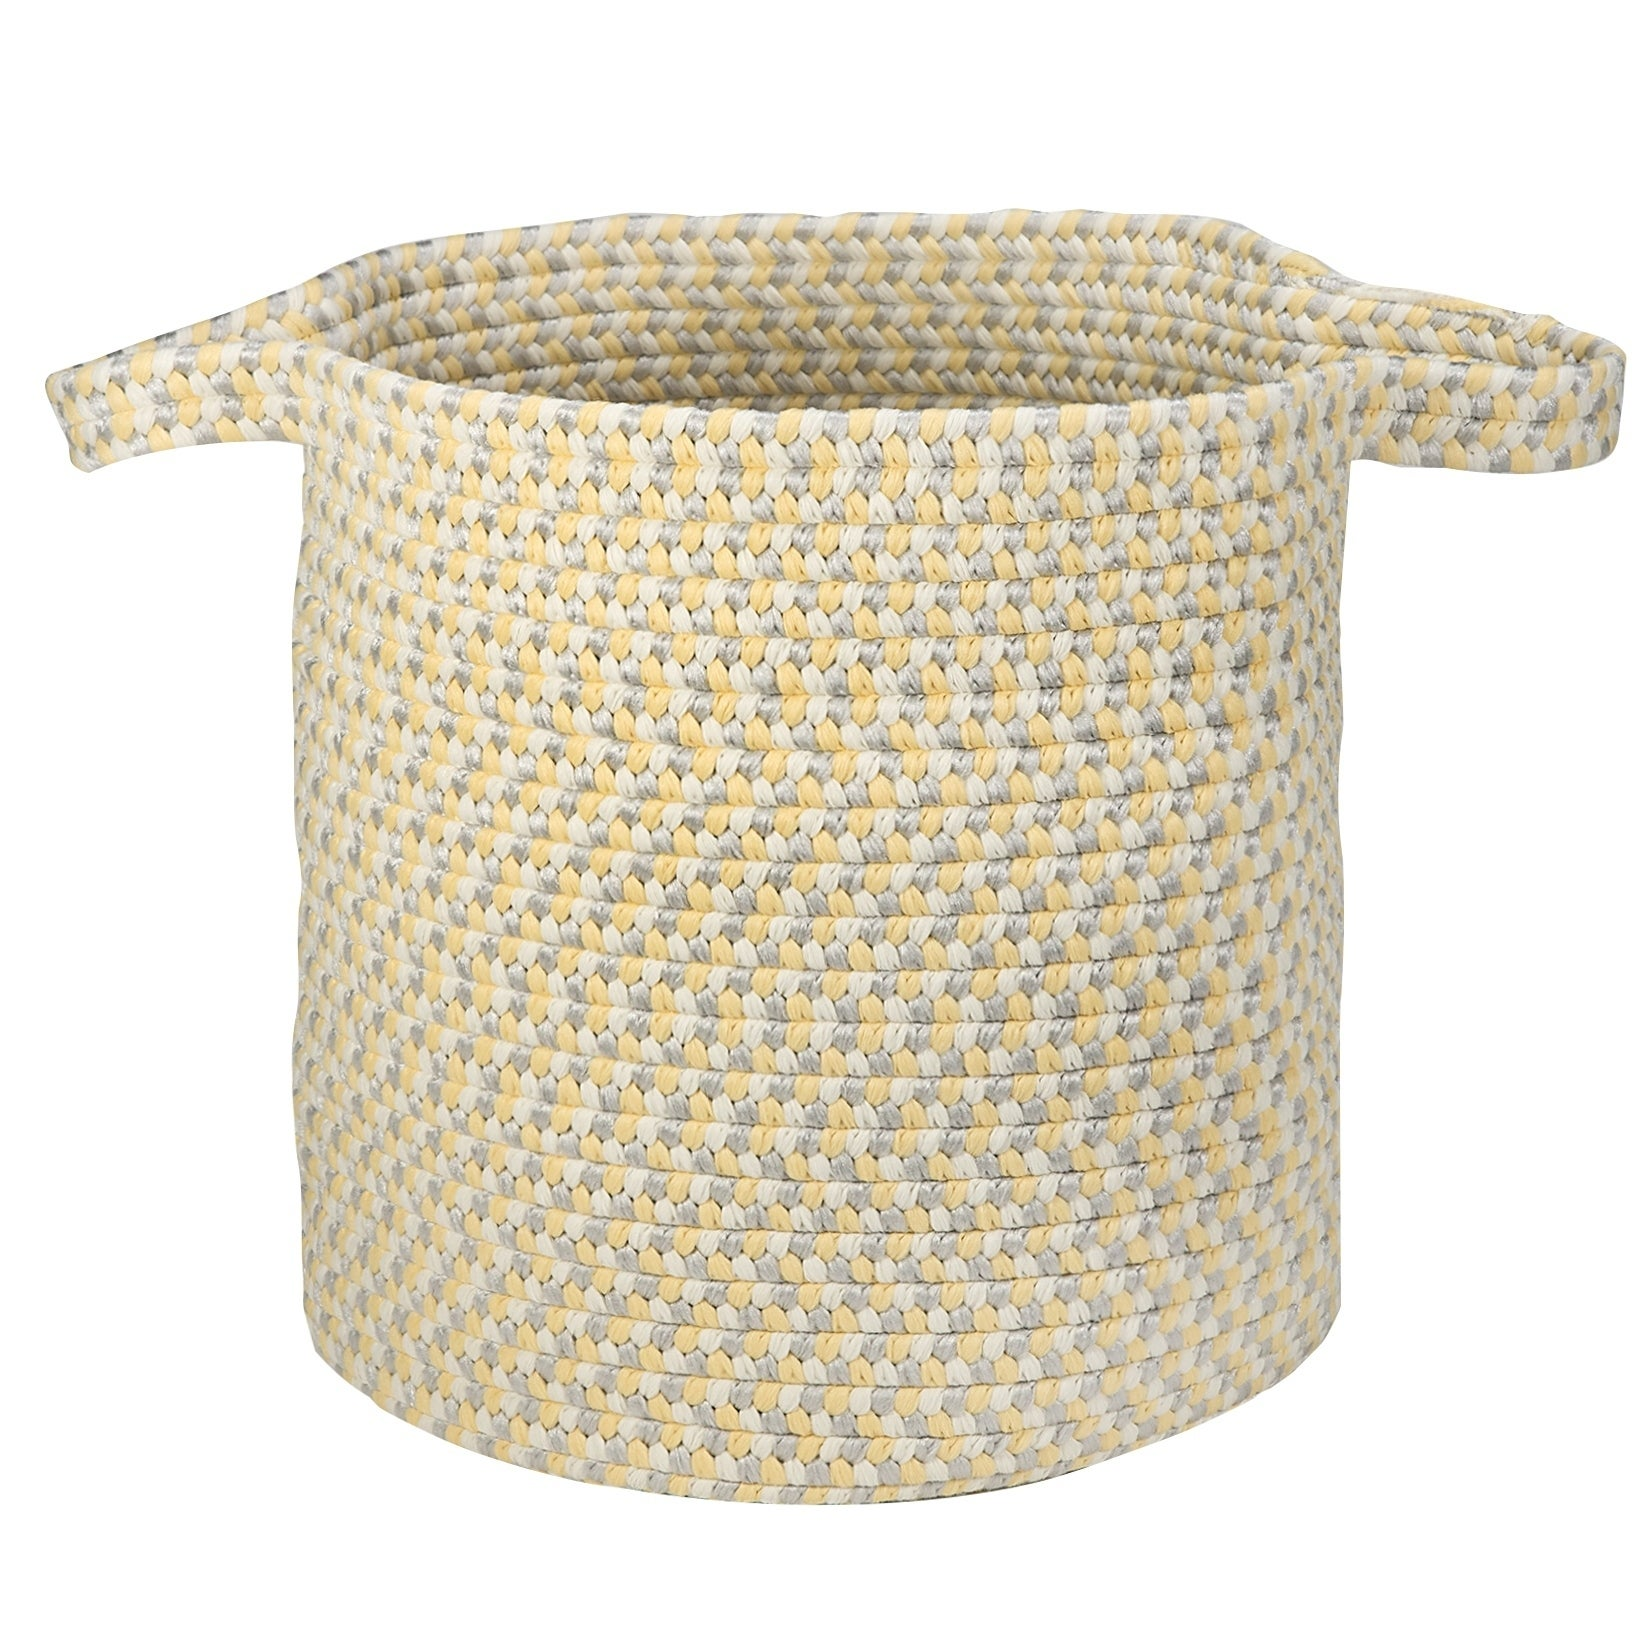 kool kids braided laundry basket raw honey